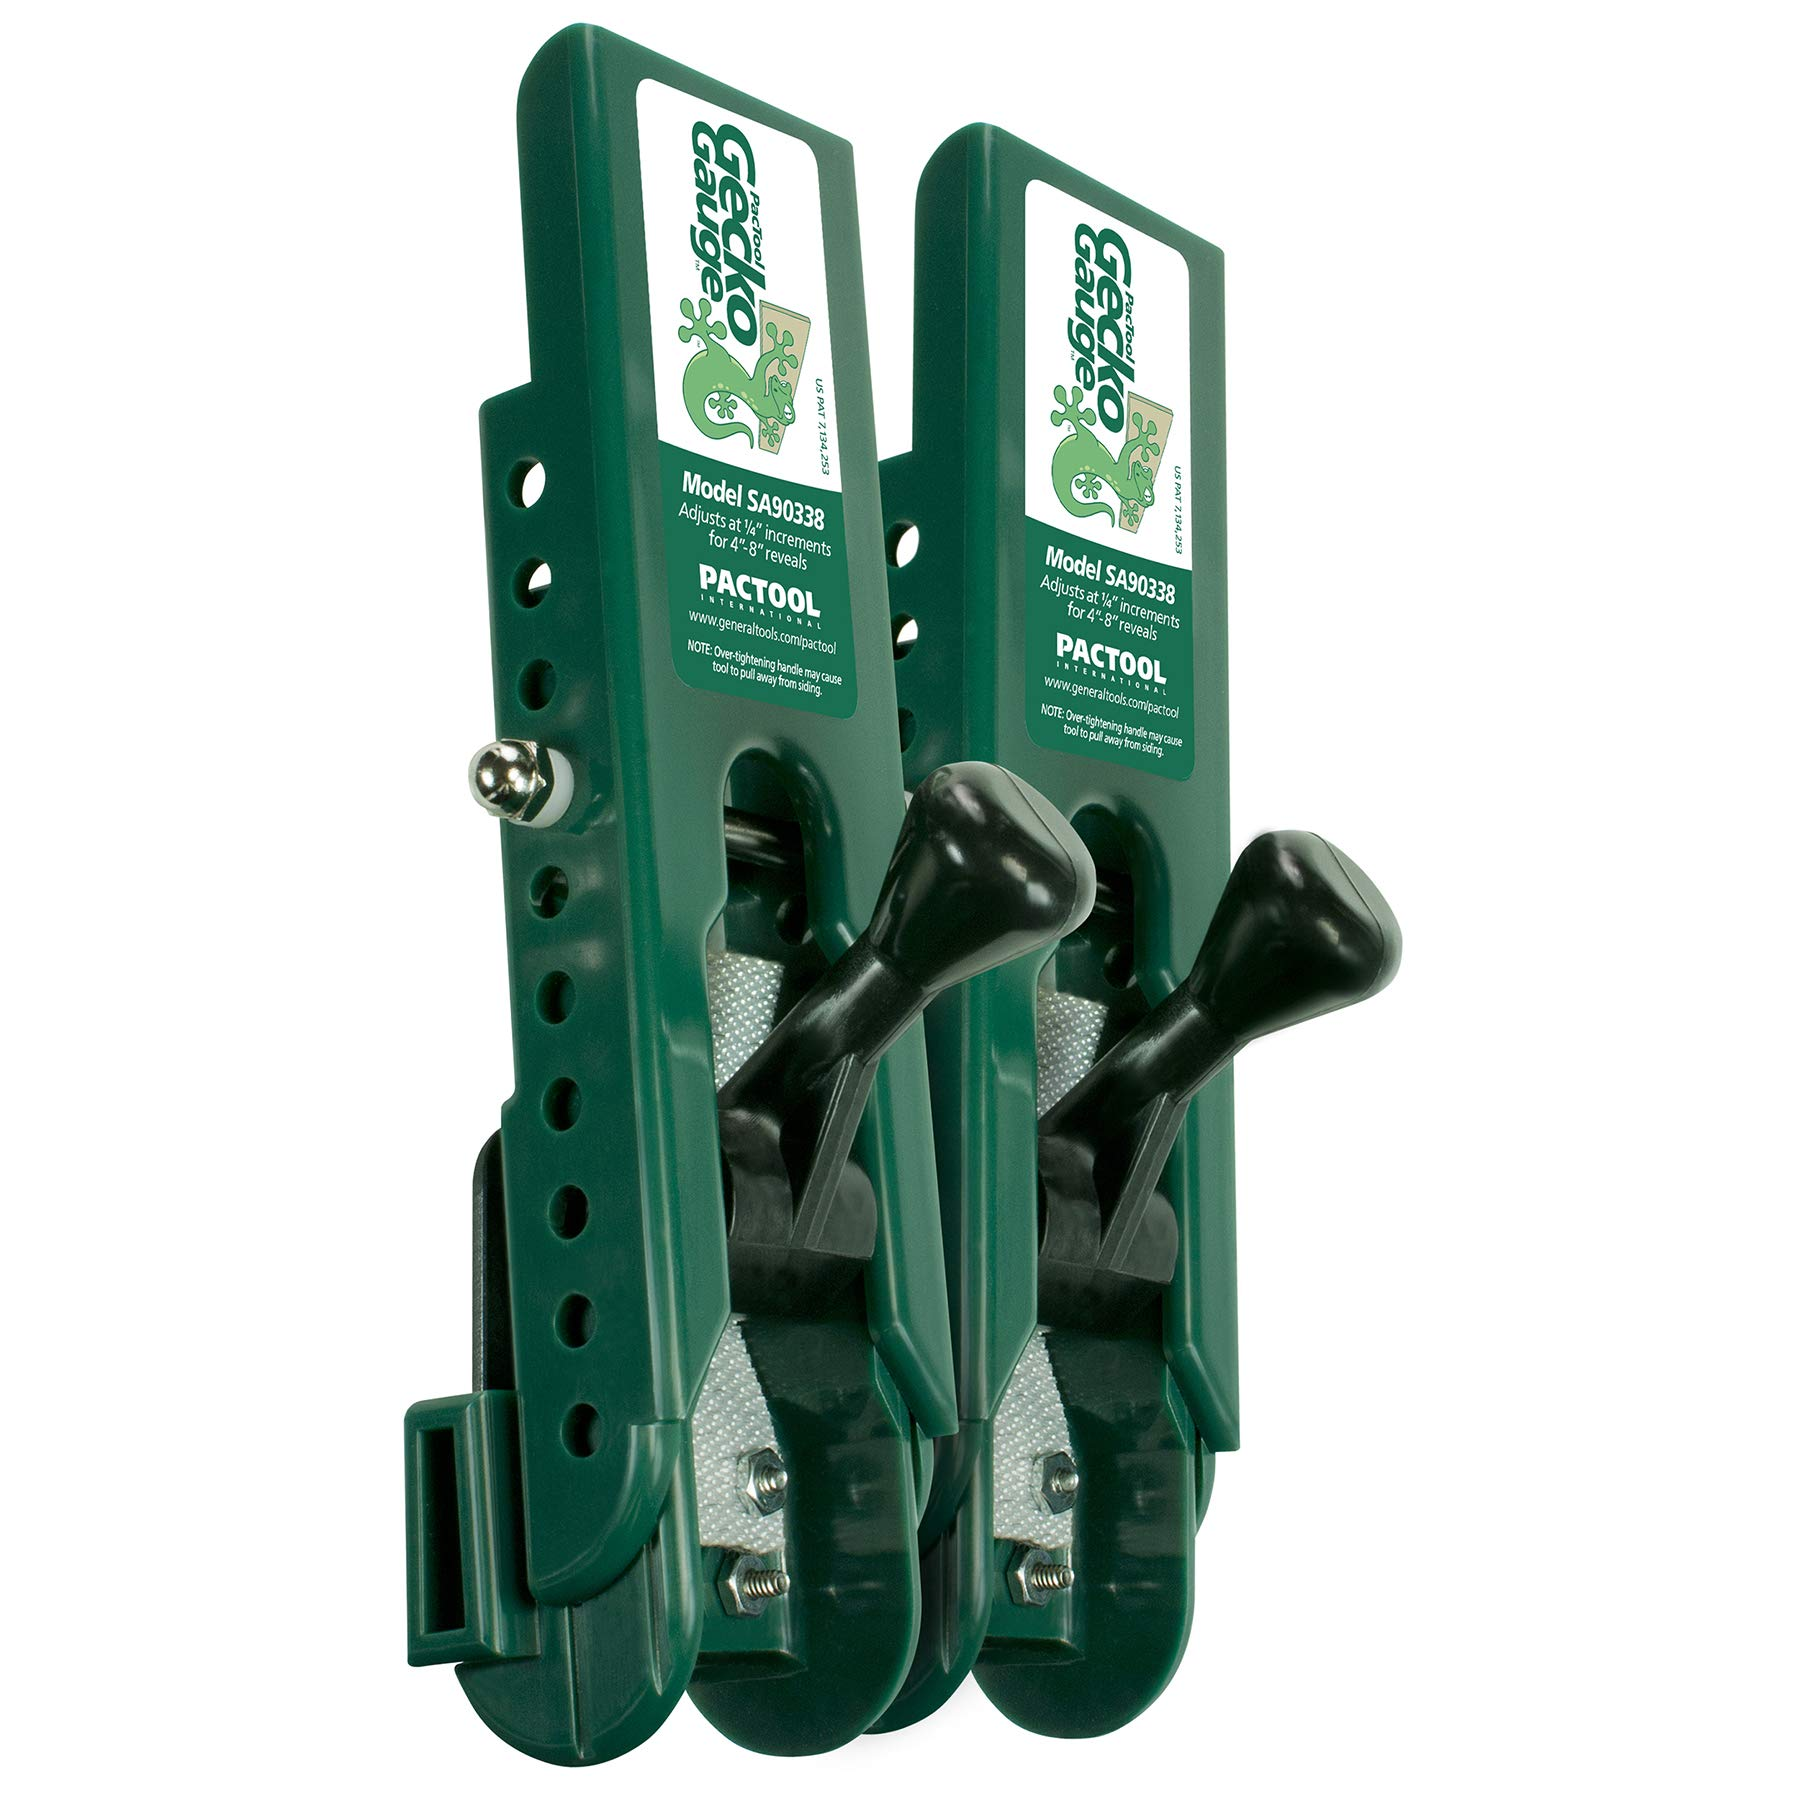 PacTool International SA90338 Gecko Gauge, LP Siding Installation Tool (1 Set) by PacTool